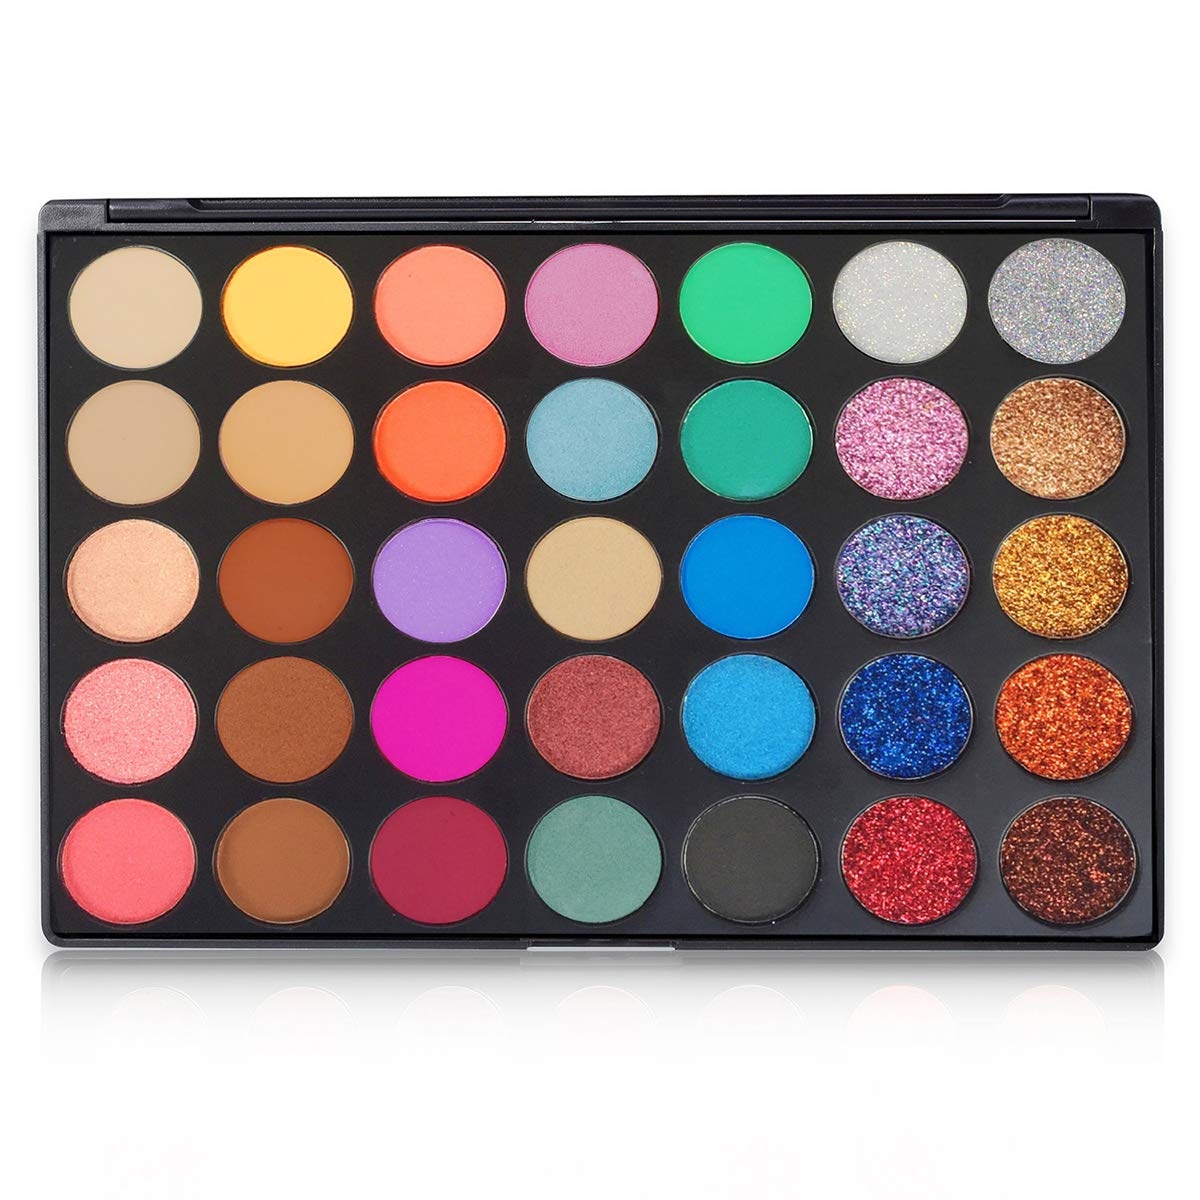 FindinBeauty 35 Colors Eyeshadow Palette Makeup Set, 15 Matte + 10 Shimmer + 10 Pressed Glitter Blending Powder - Bright Natural Smoky Multi Reflective Shades Velvet Texture Eye Shadow Kit